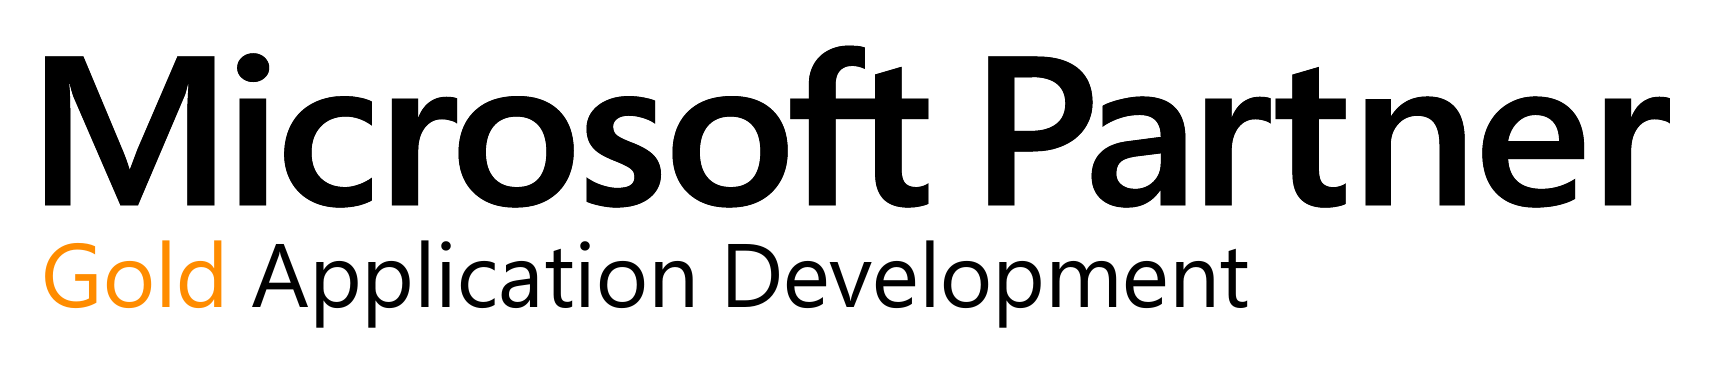 TIMS-Software-Microsoft-Gold-Application-Development-2018